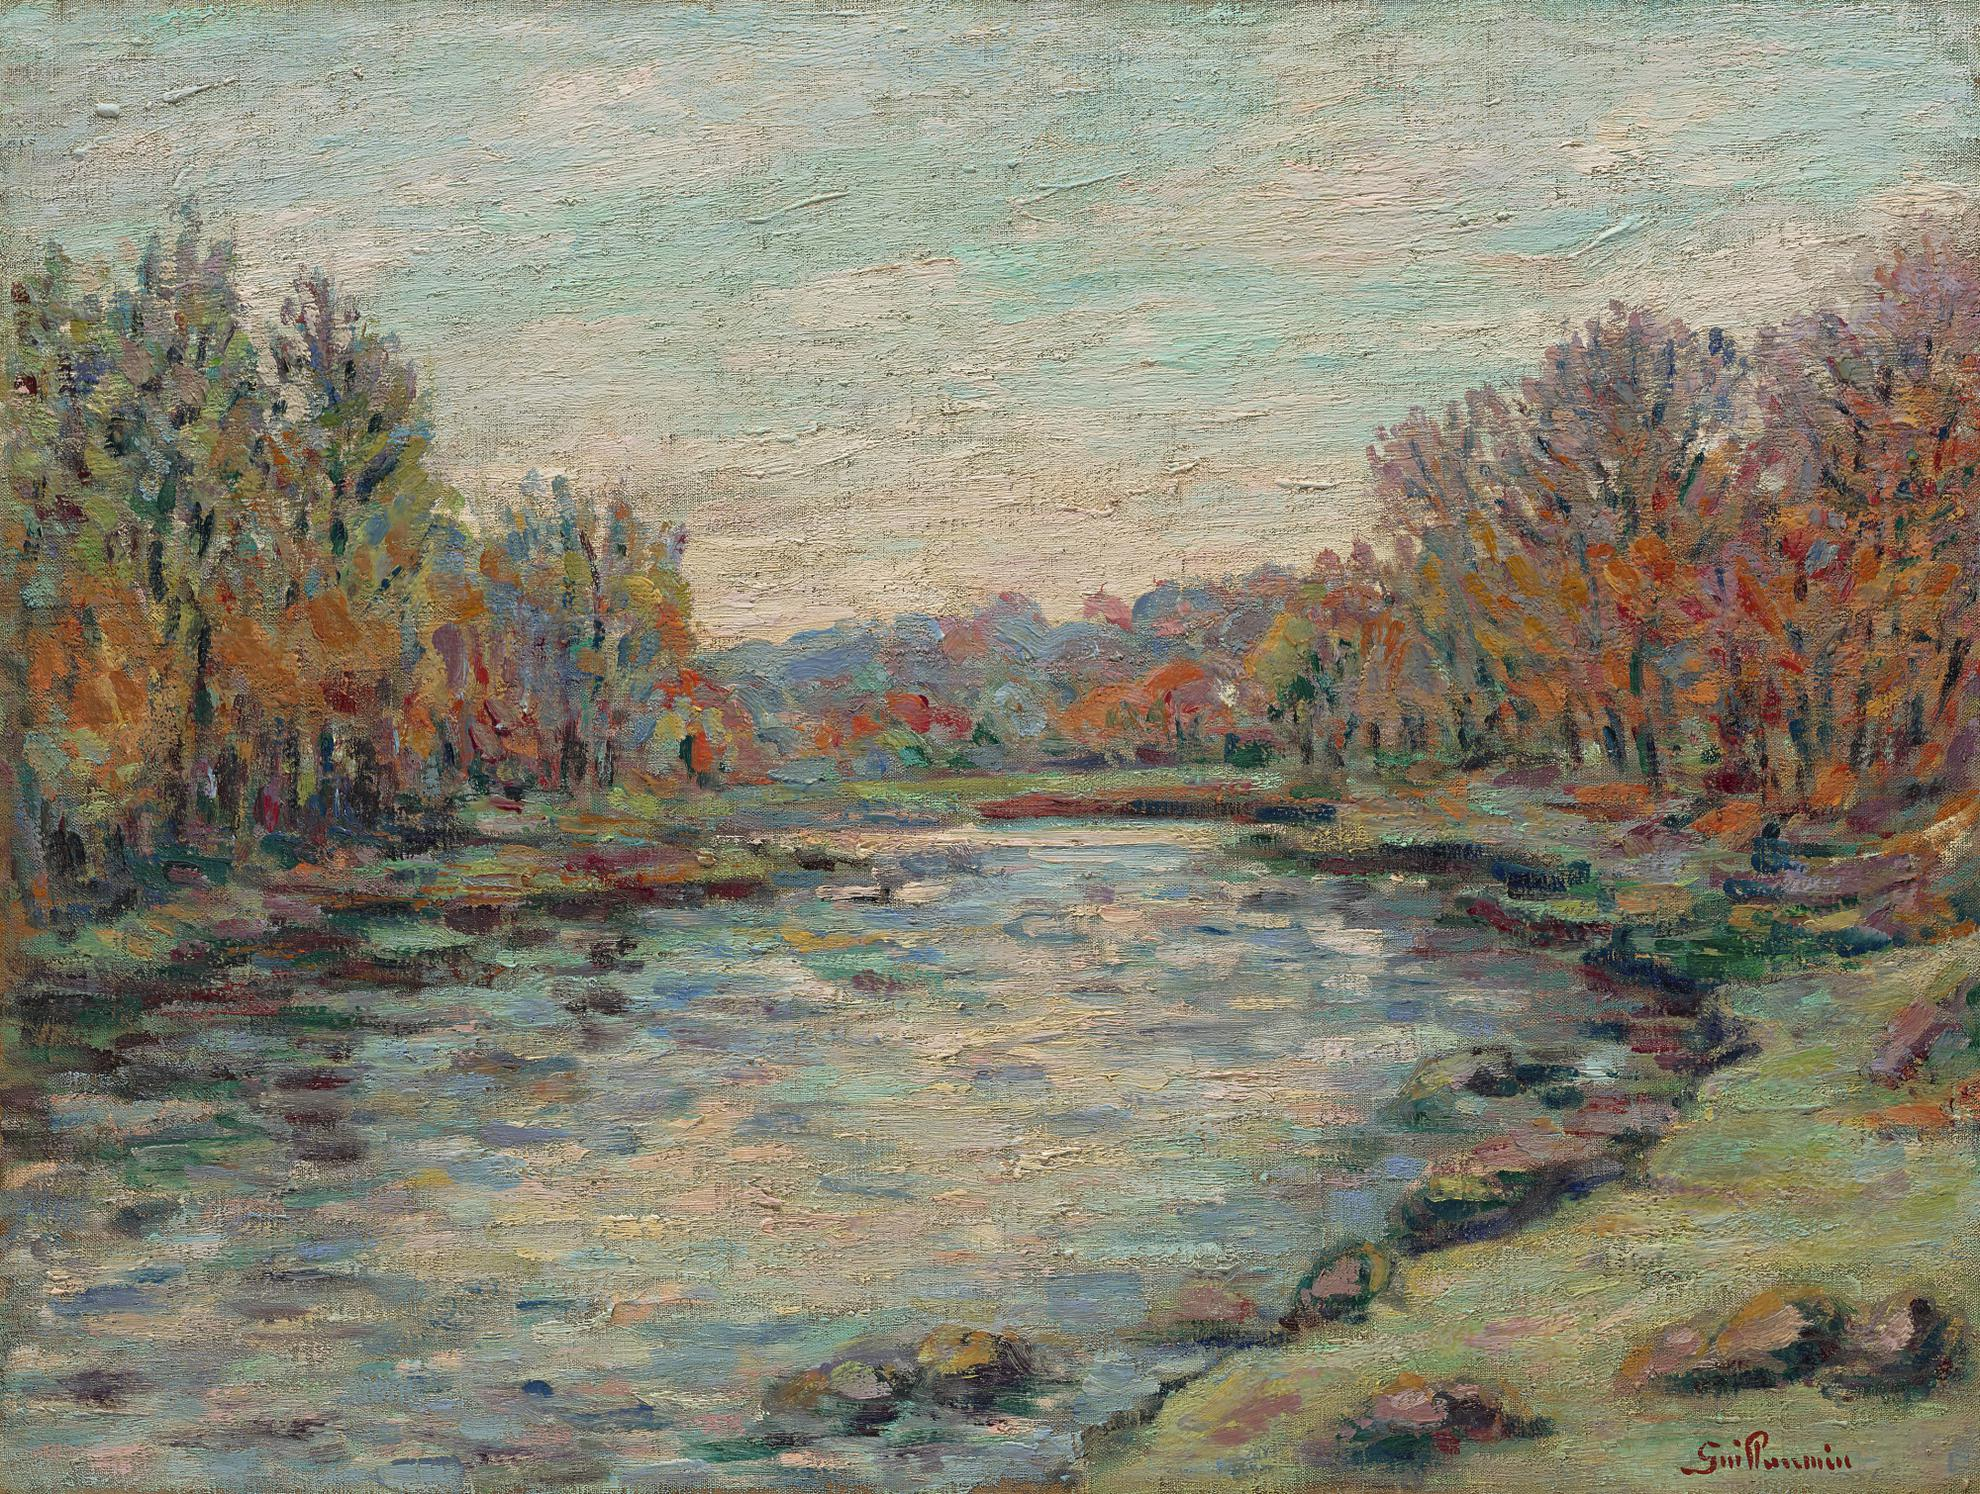 Jean-Baptiste Armand Guillaumin-Barrage De Genetin-1900